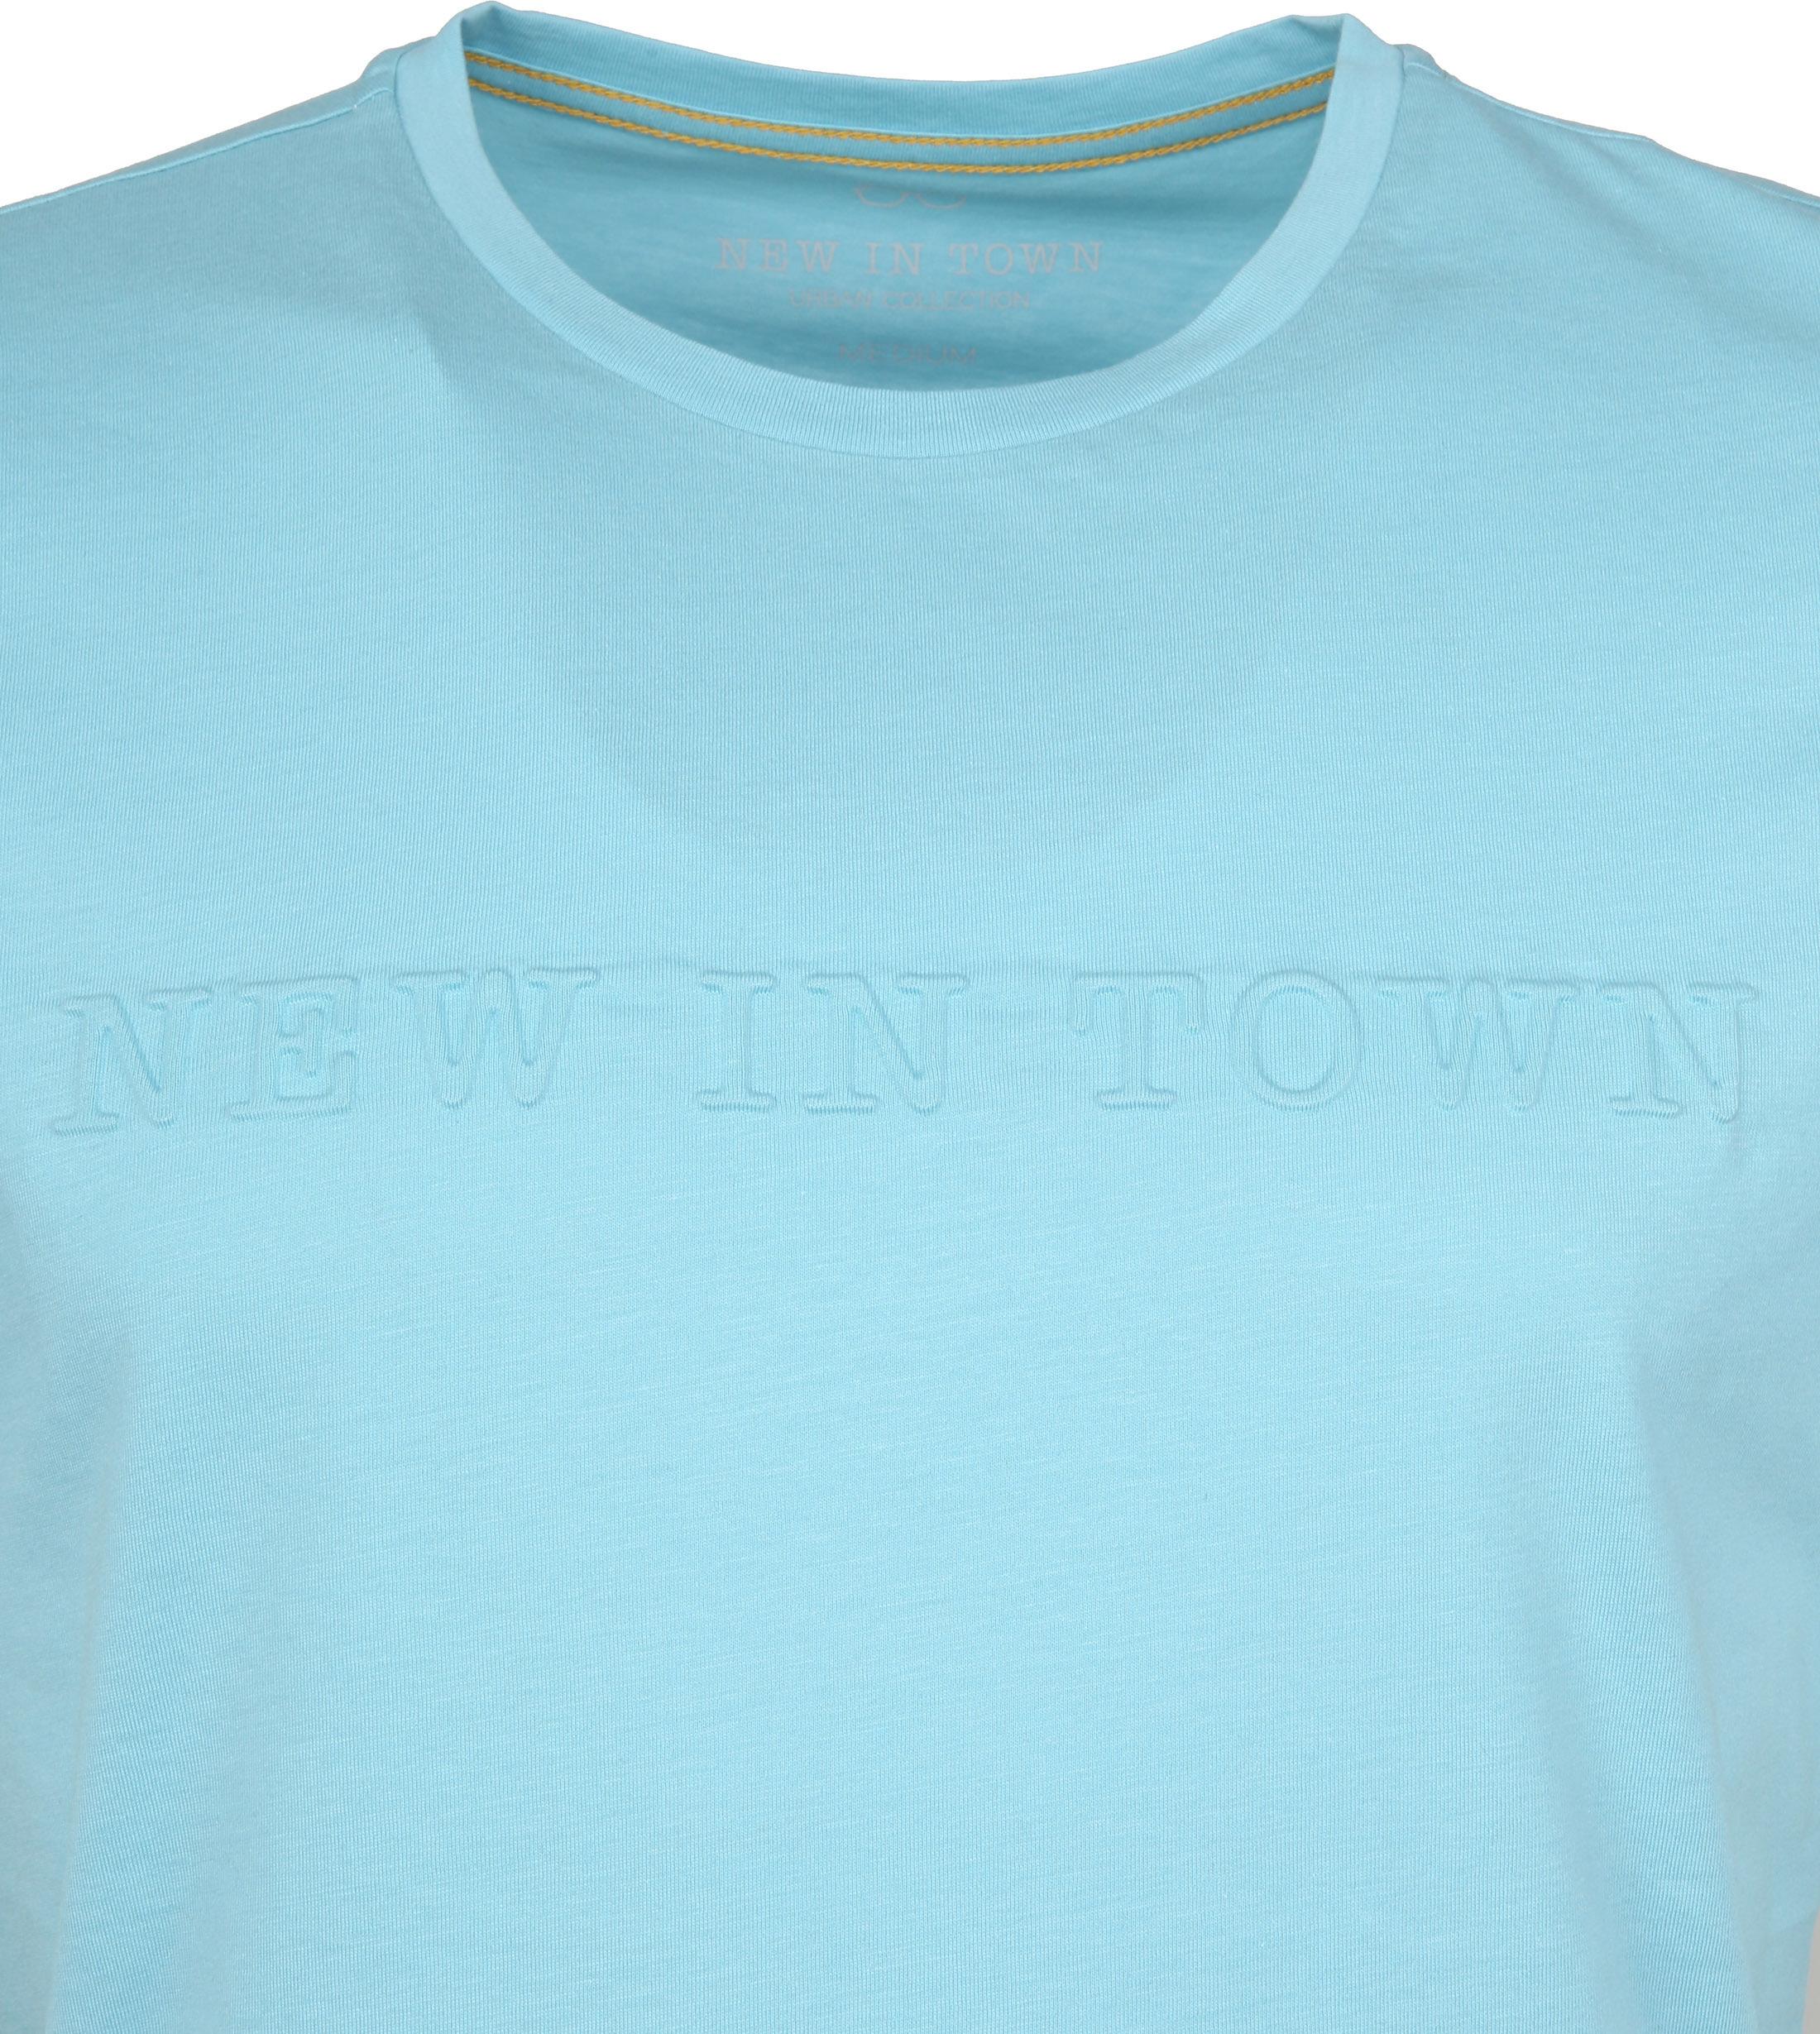 New in Town T-shirt Light Blue foto 1